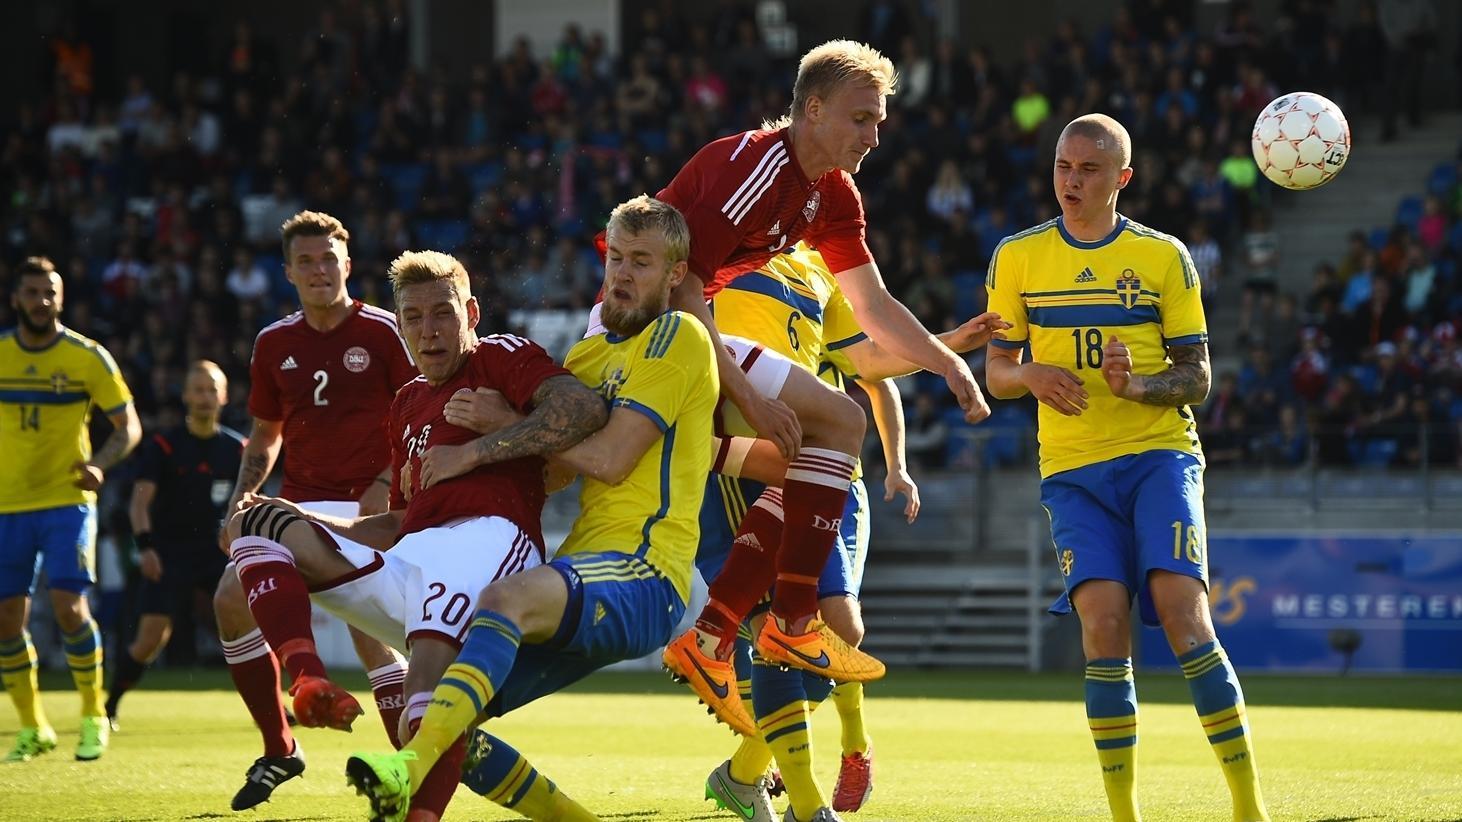 ЕВРО среди молодежи - Дания-Швеция - История и факты: Дания ...